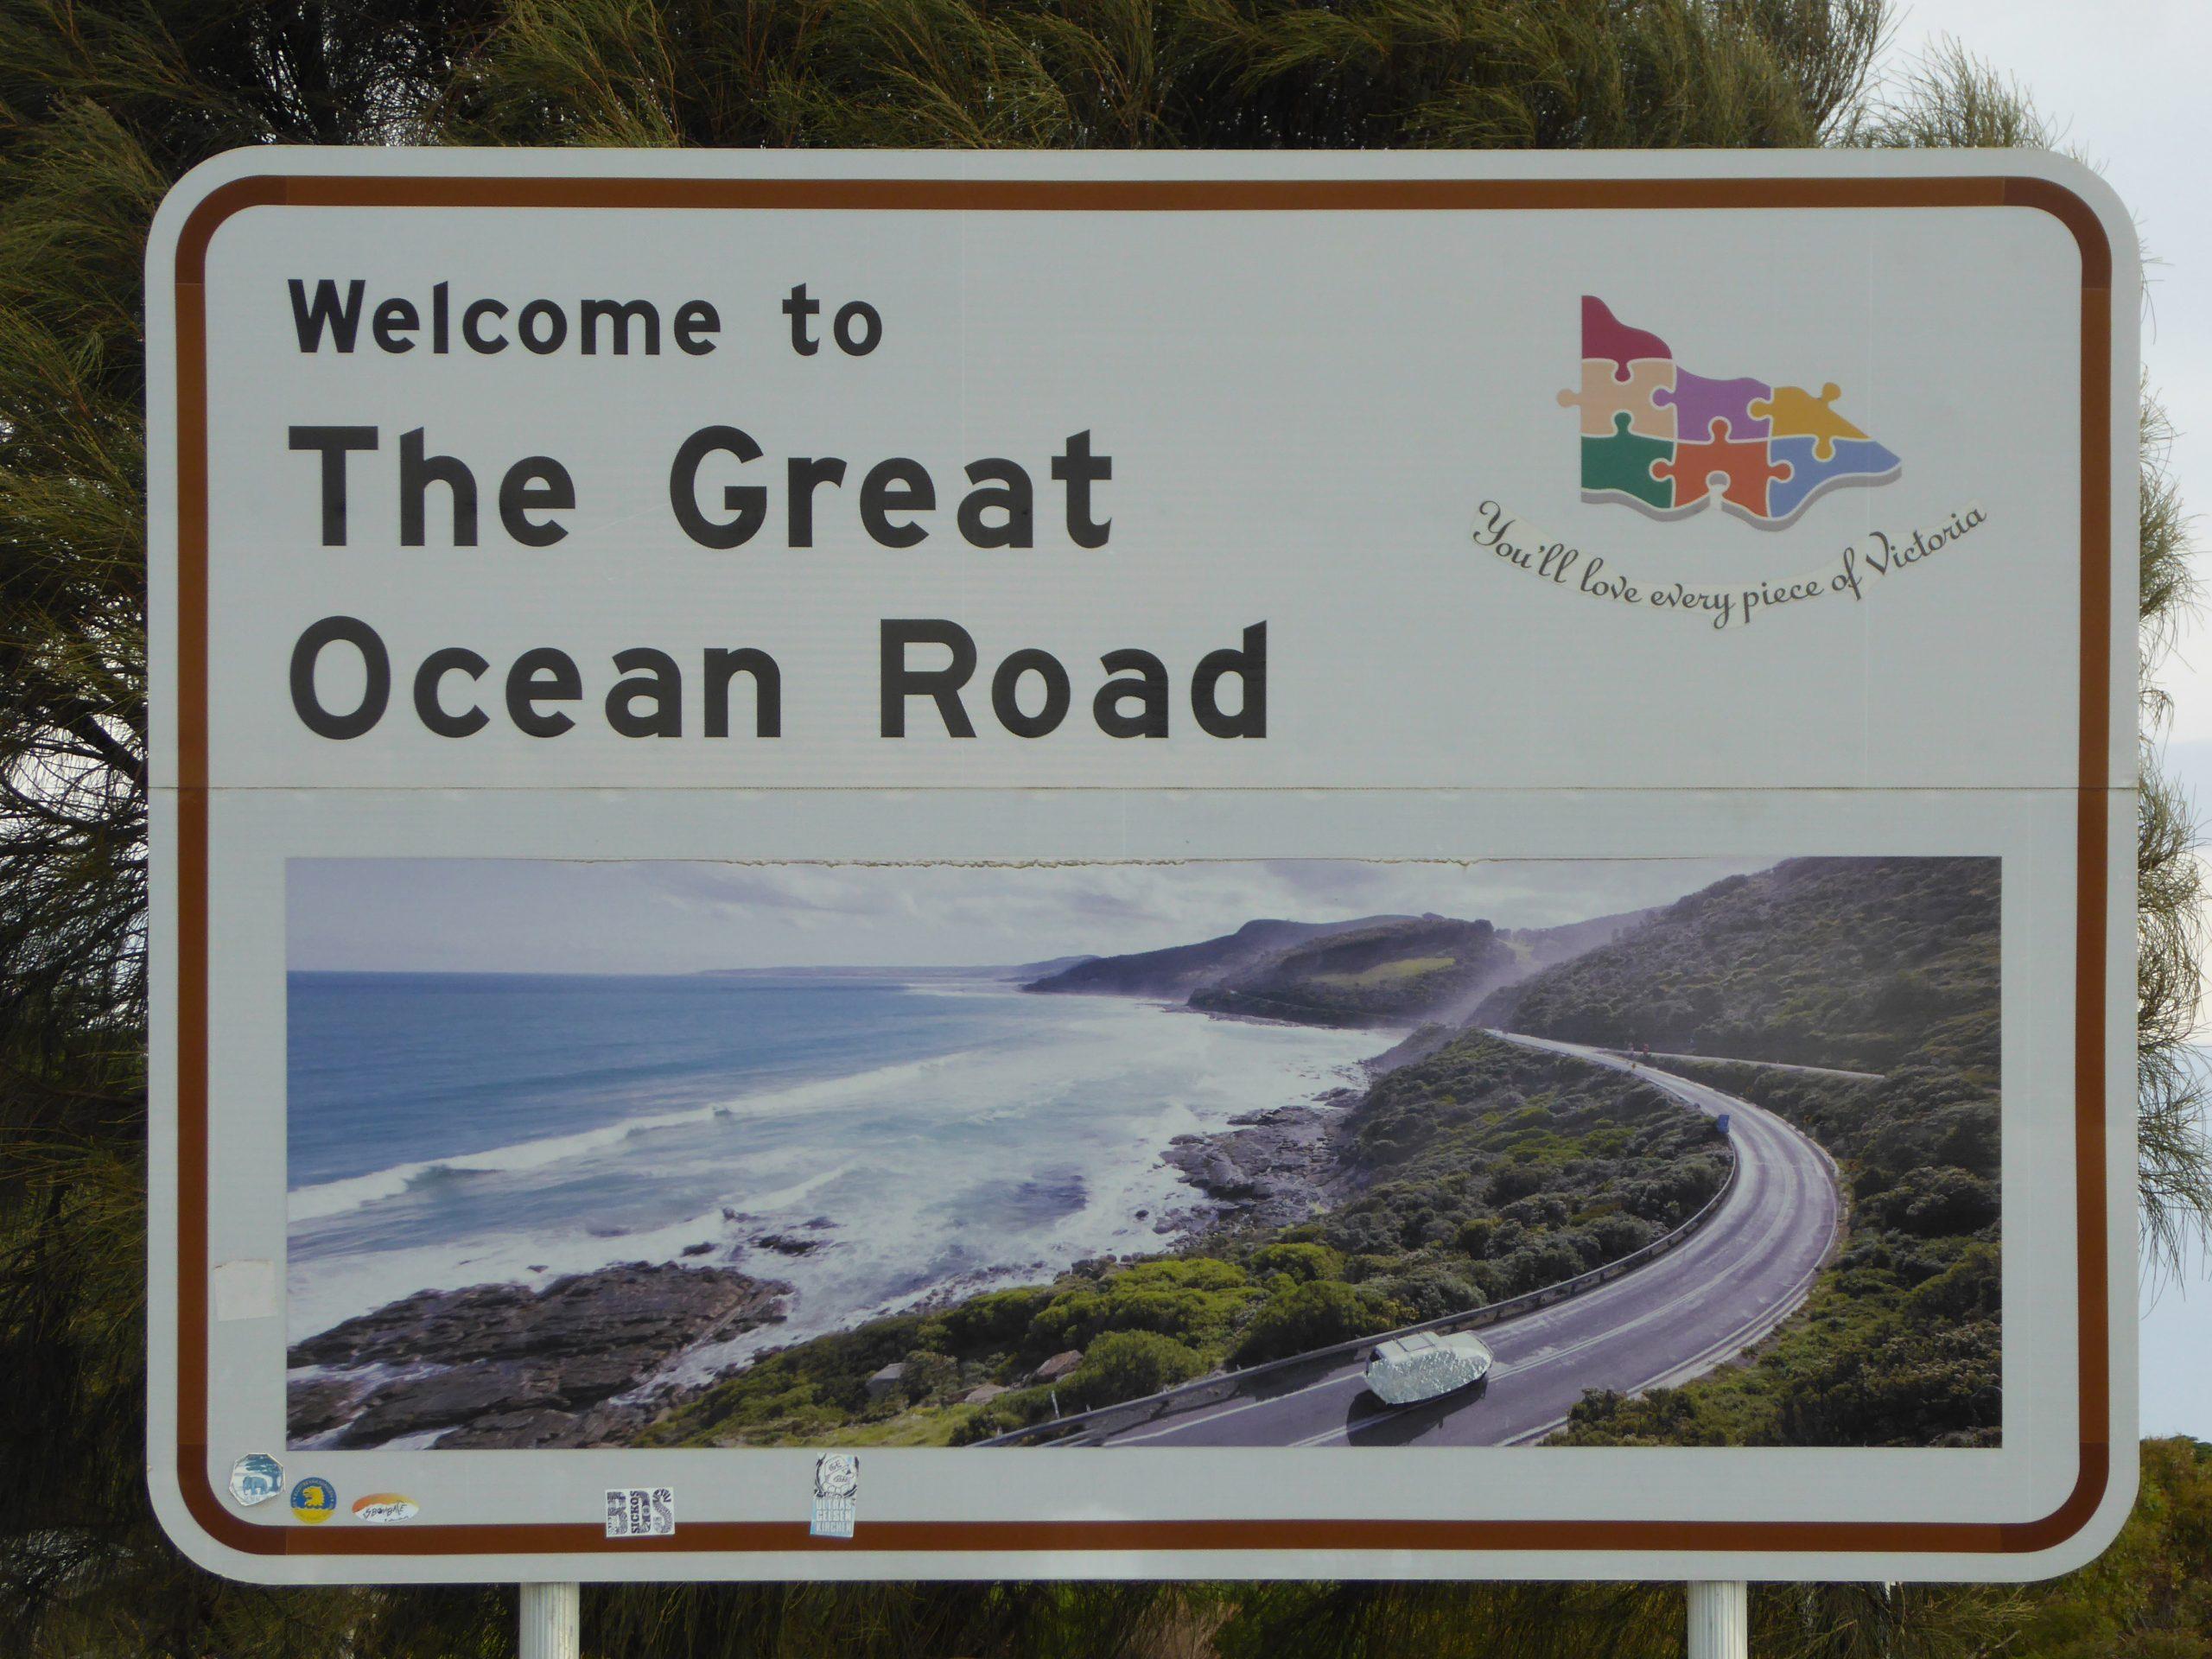 Radreise Australien 2016 - Great Ocean Road